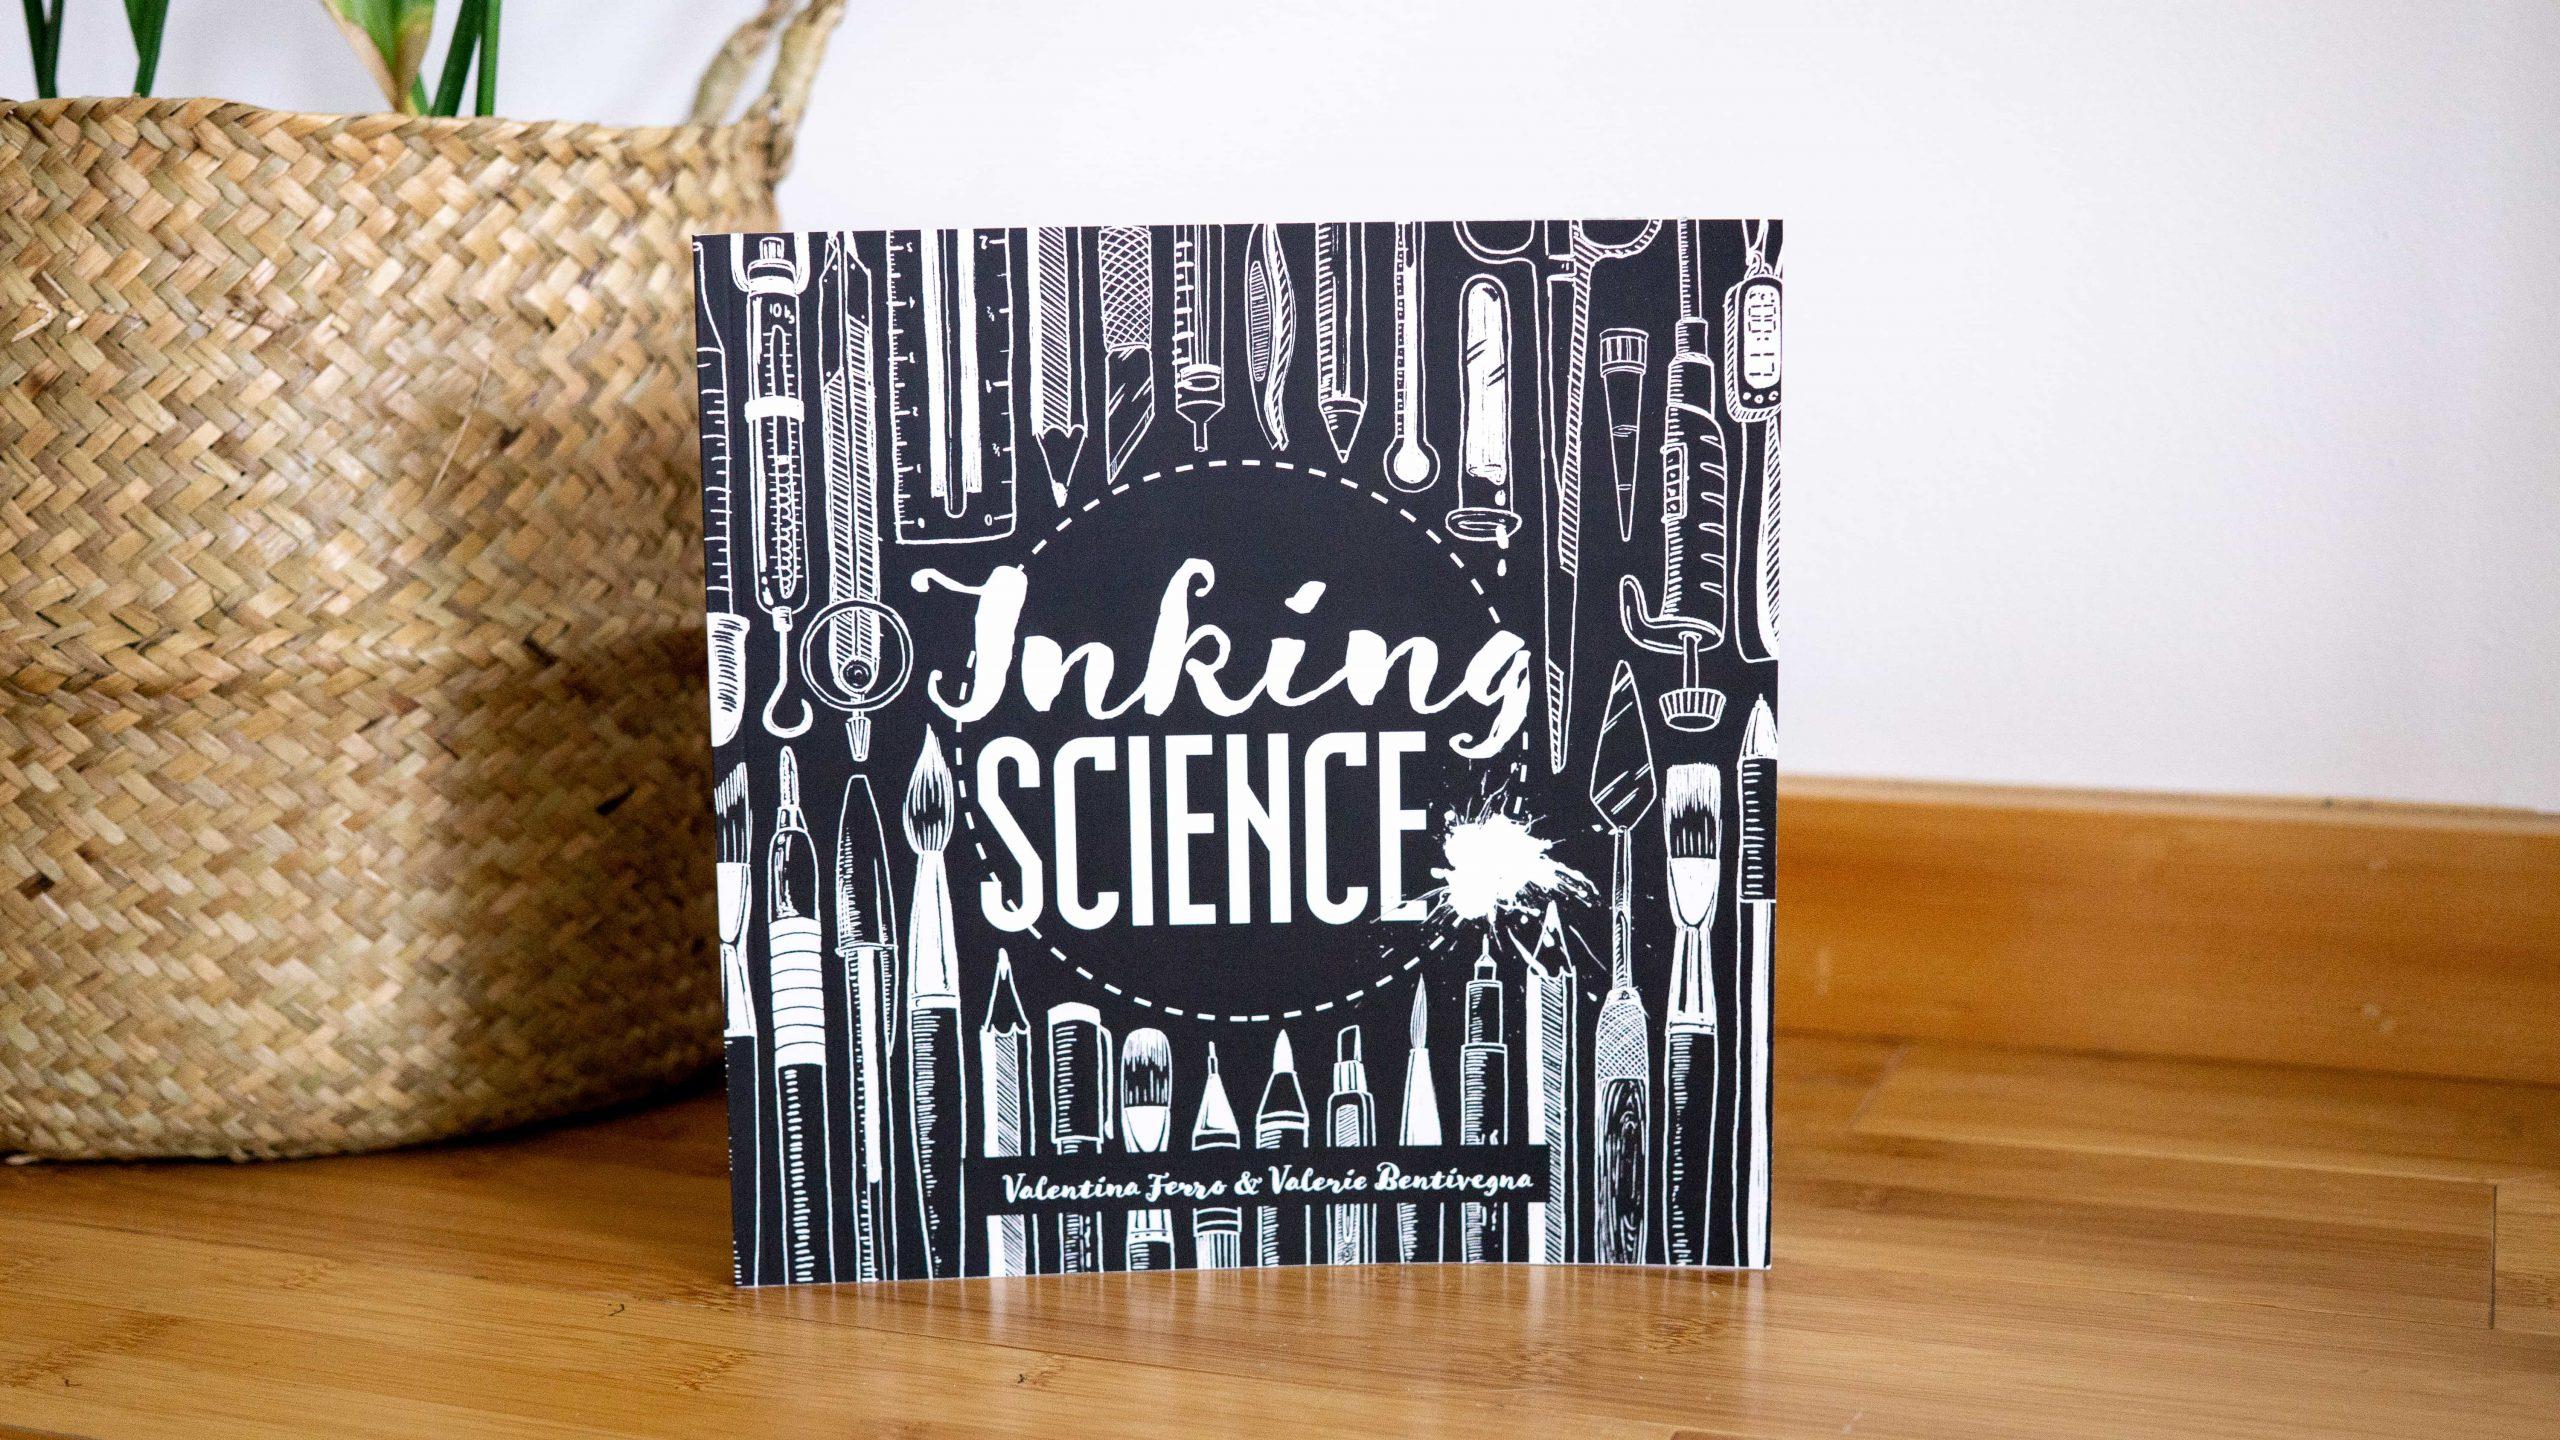 Inking Science (paperback) – Defective copies